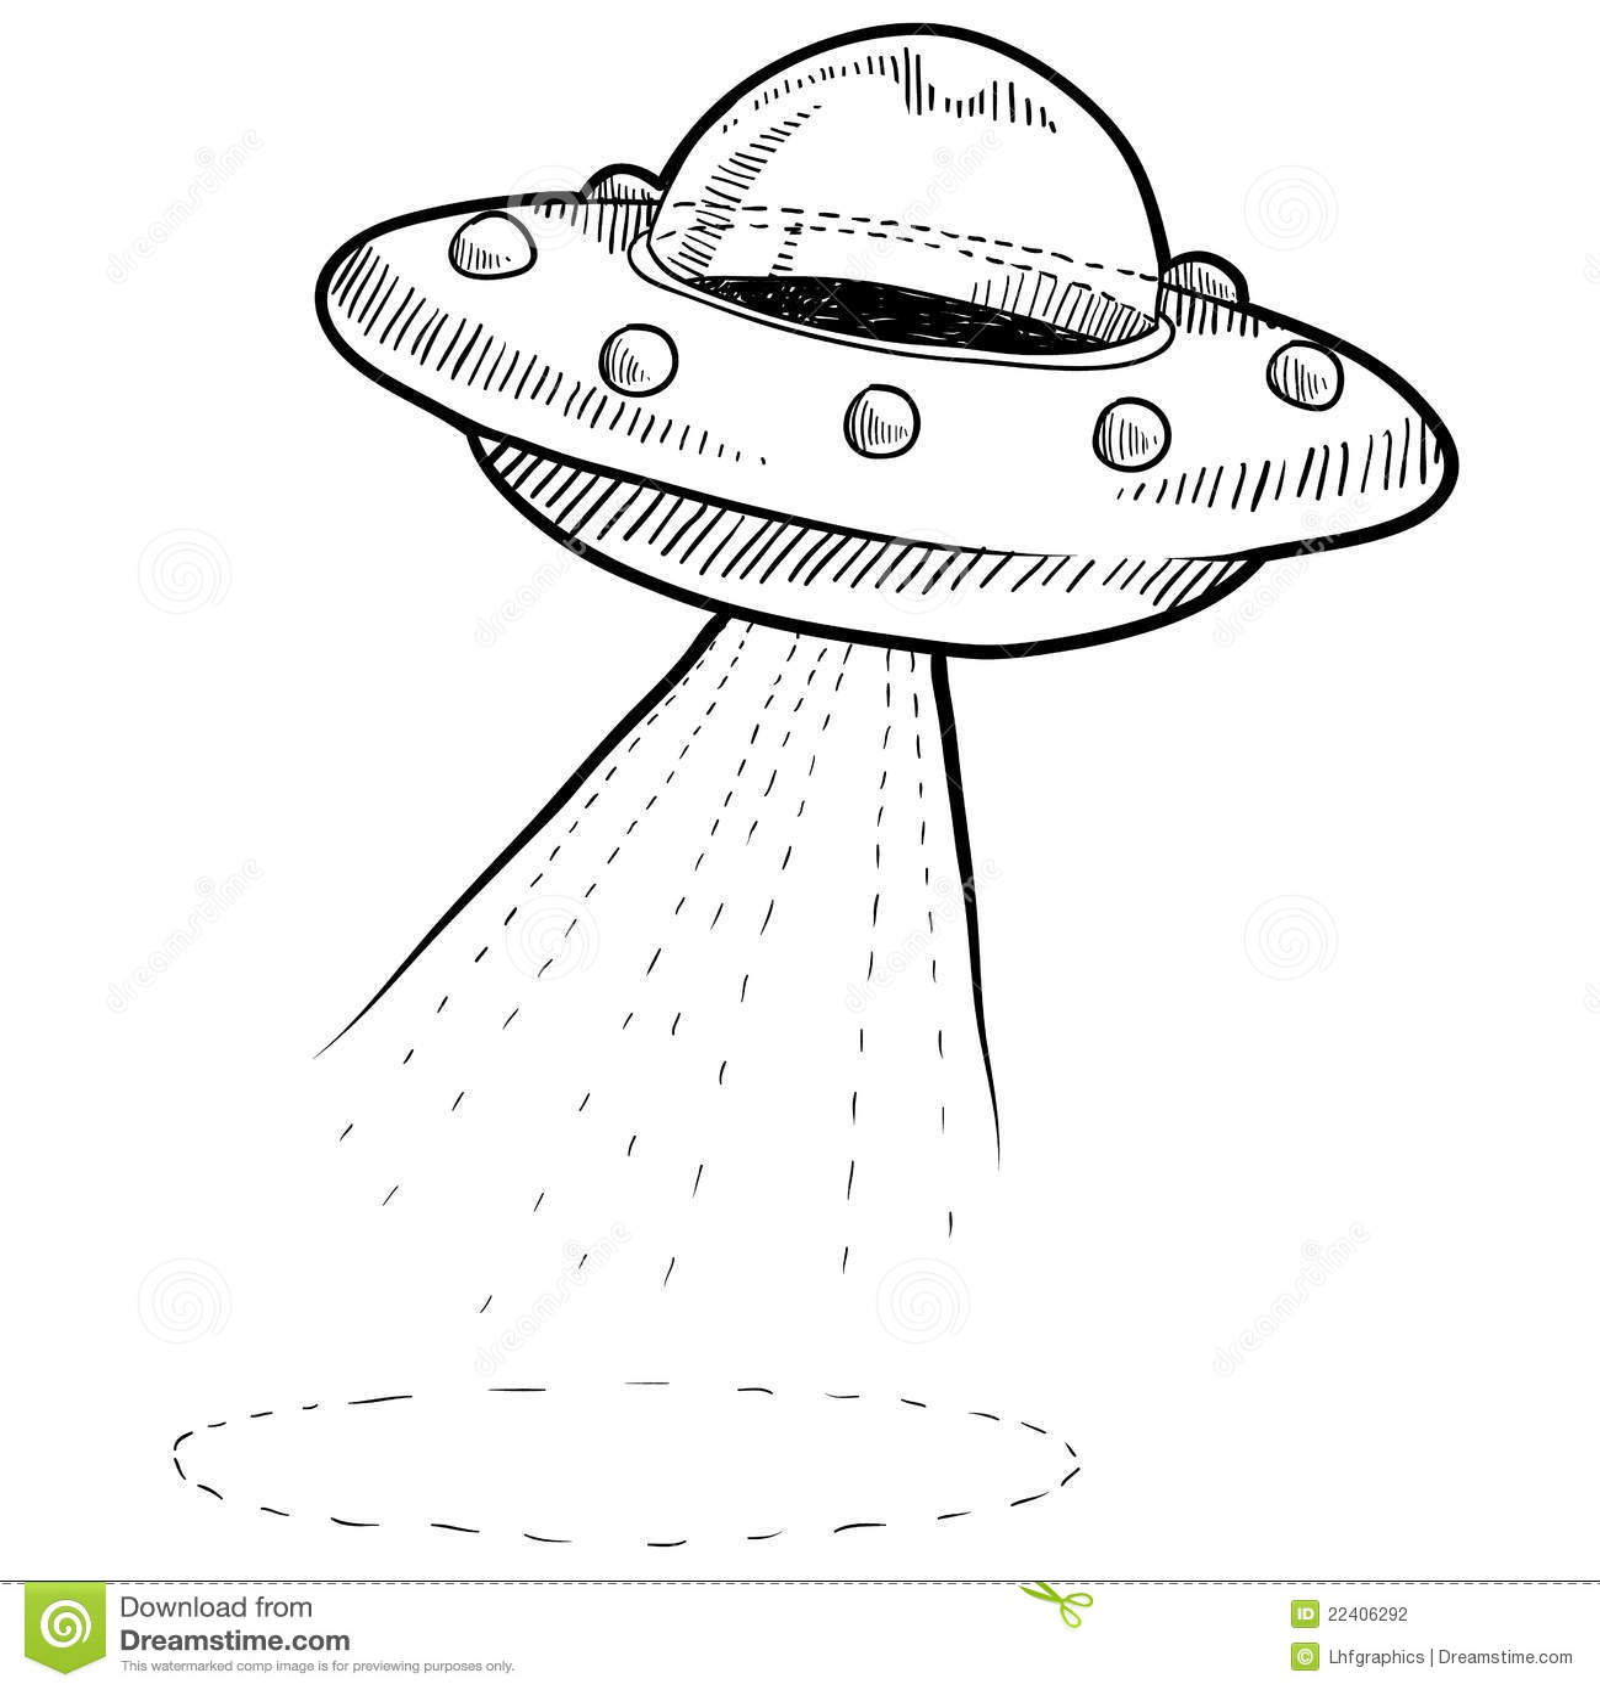 Retro Ufo Drawing Stock Vector Illustration Of Crowd